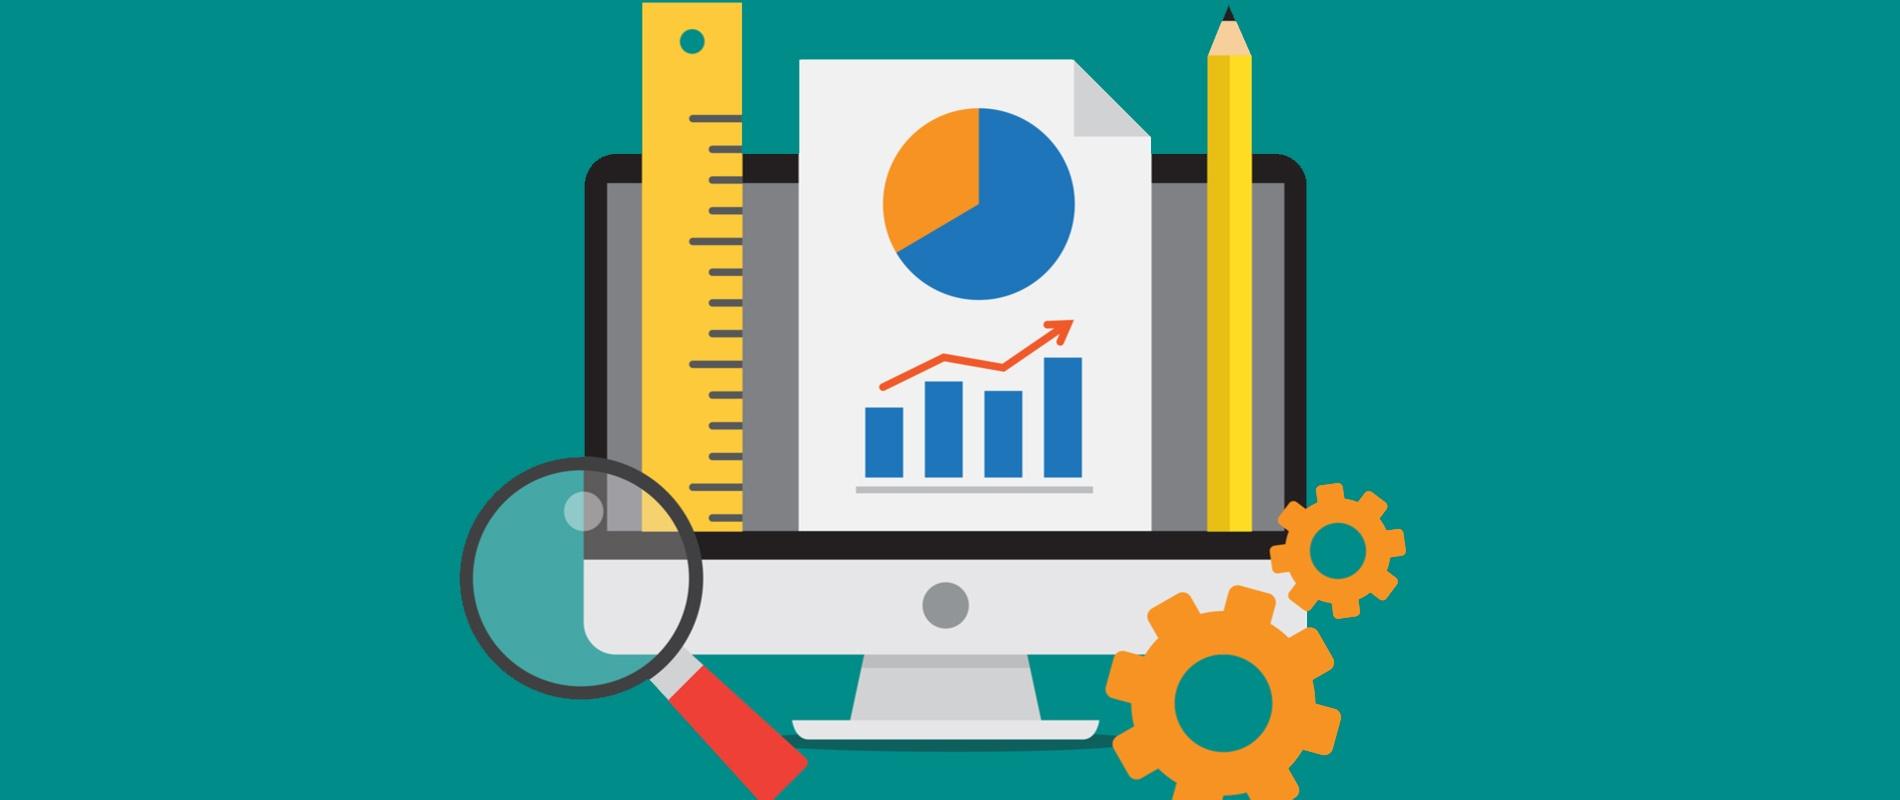 decoding website metrics